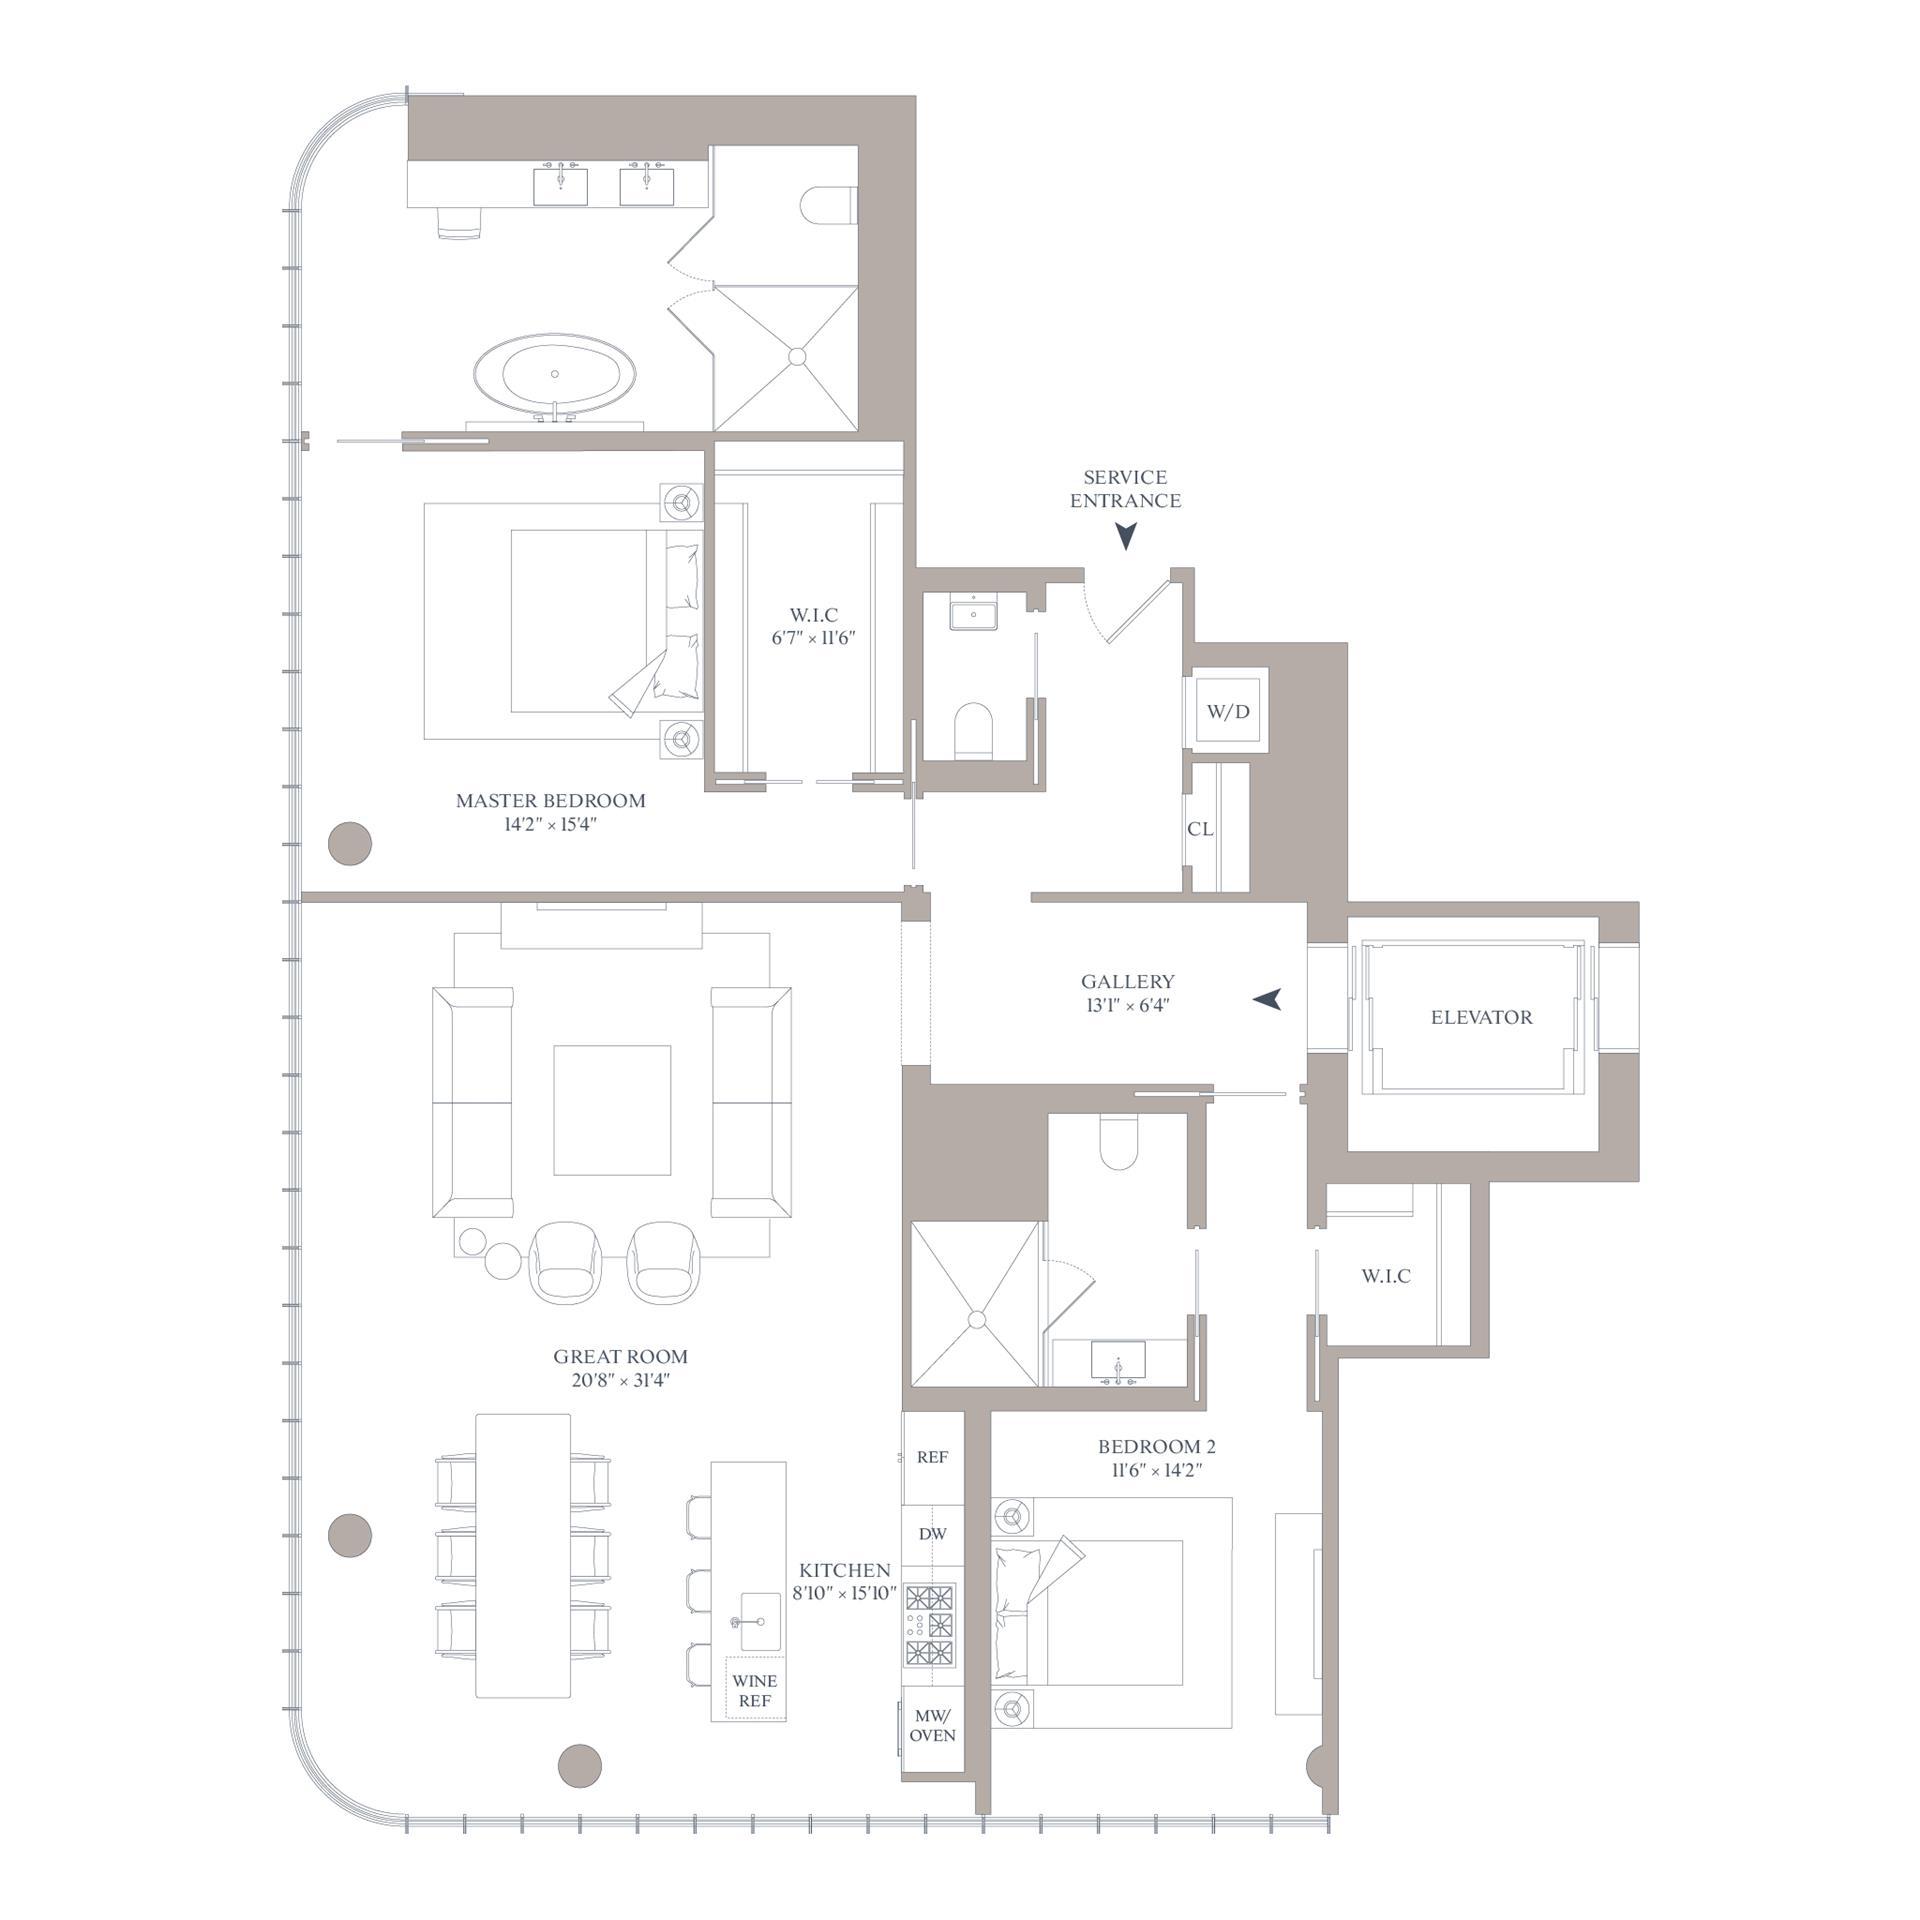 Floor plan of 565 Broome St, S21A - SoHo - Nolita, New York